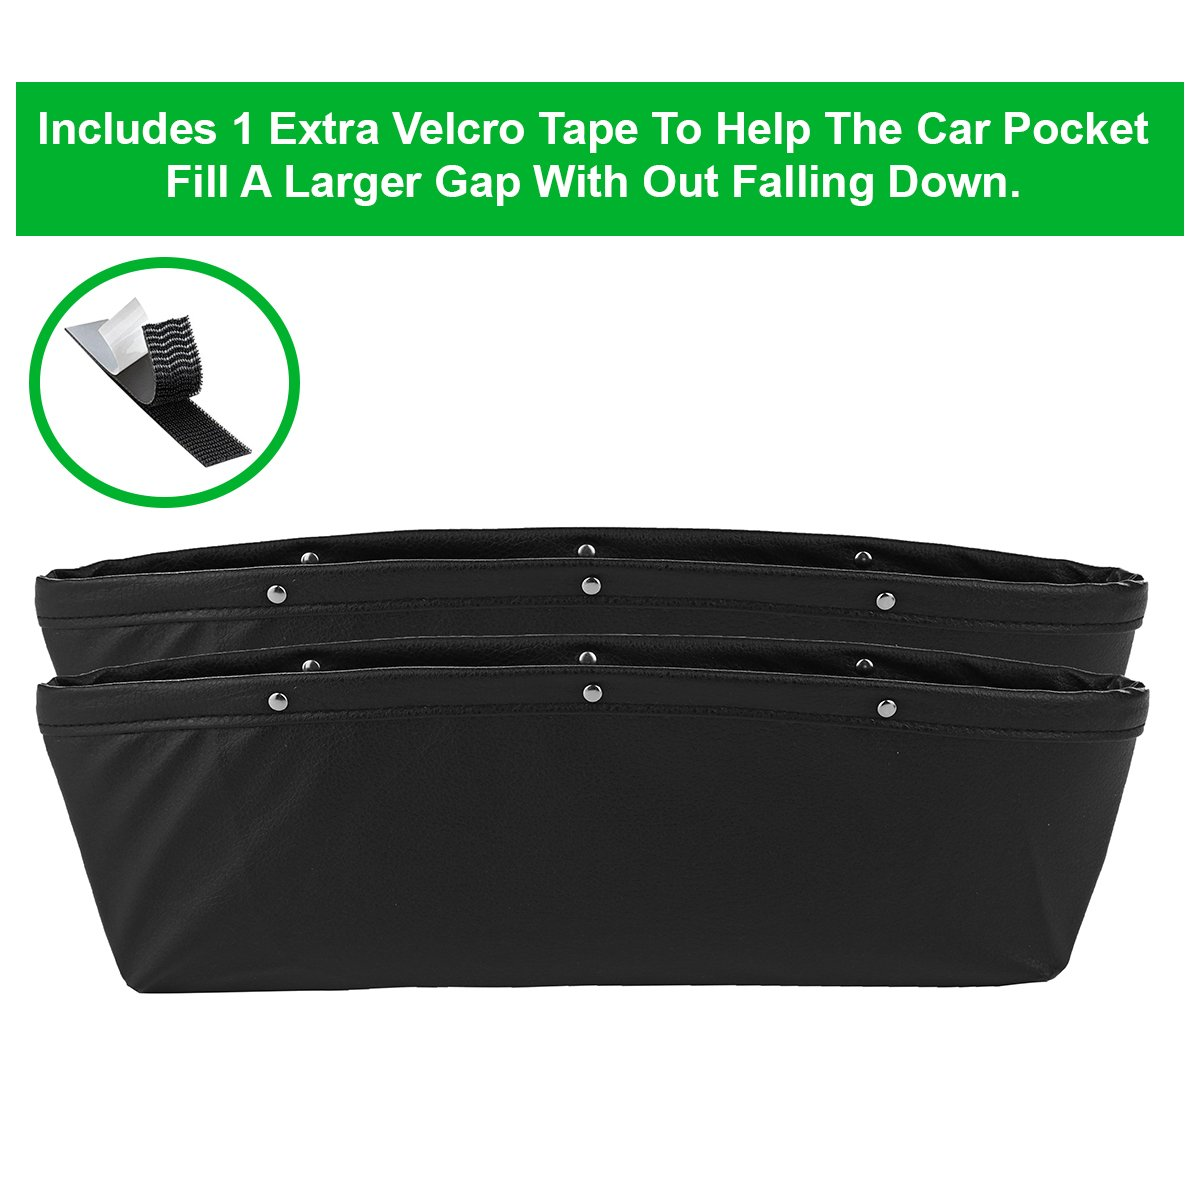 Car Seat Side Drop Caddy Catcher Car Interior Accessories Car Pocket Organizer lebogner 2 Pack Car Seat Gap Filler Premium PU Full Leather Seat Console Organizer